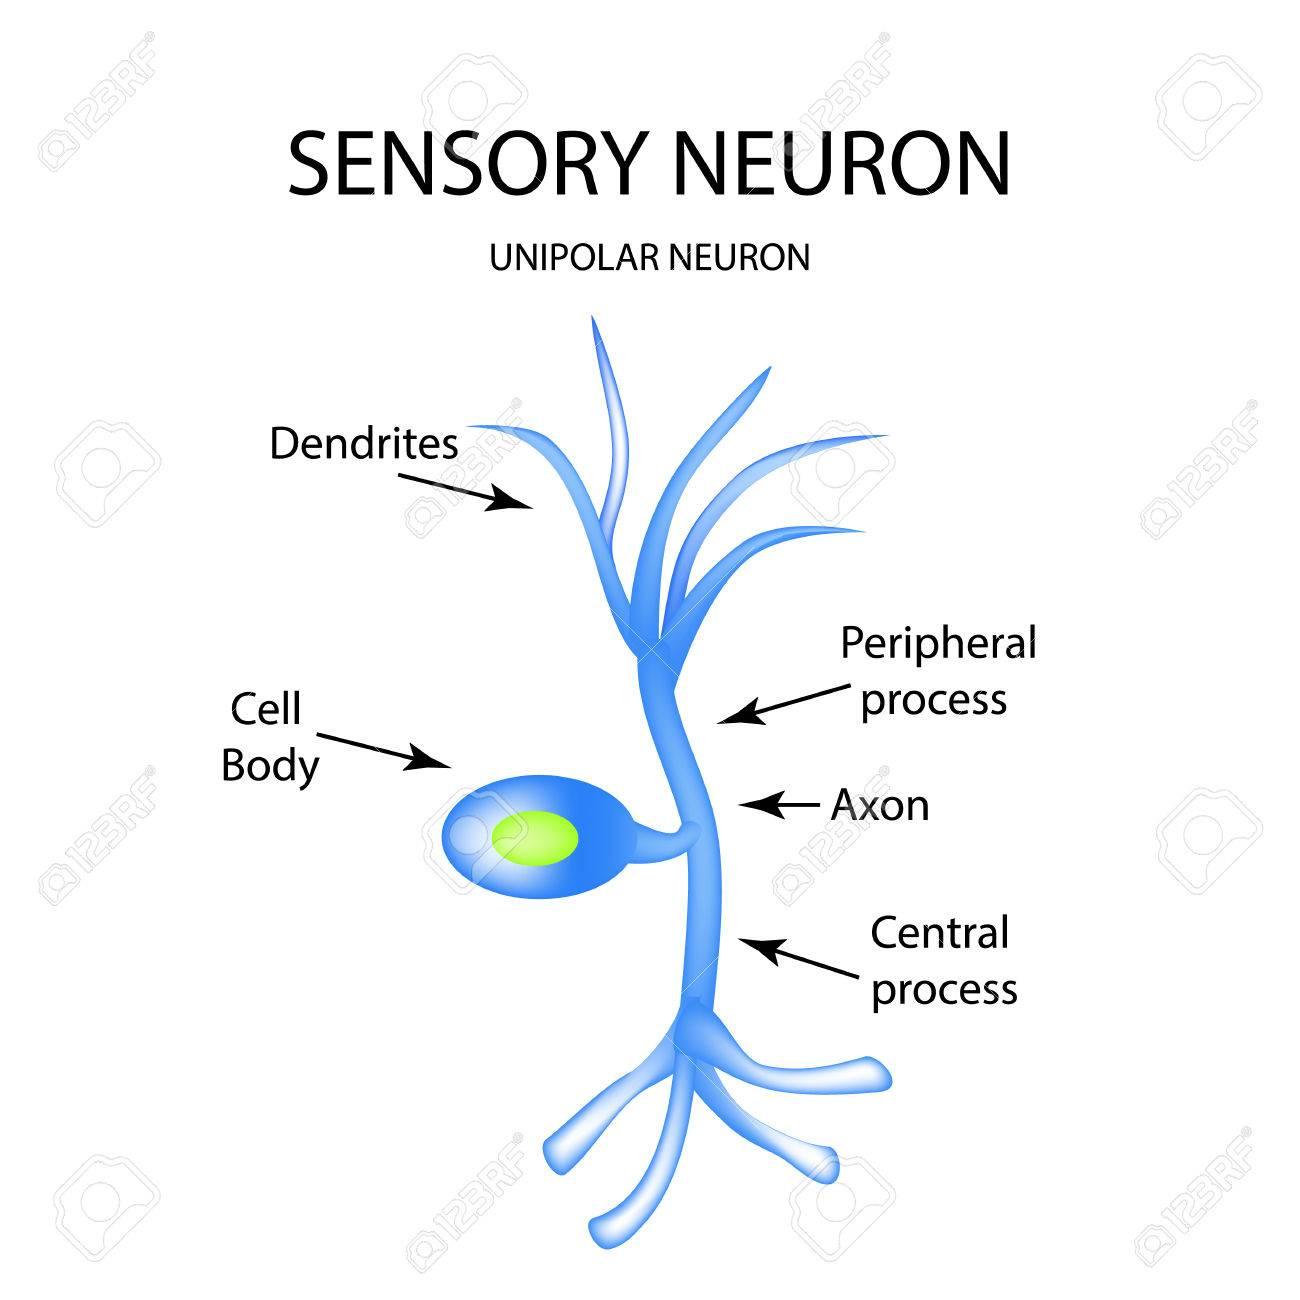 A sensory neuron diagram electrical work wiring diagram the structure of the sensory neuron infographics vector rh 123rf com sensory neurons diagram without labels association neuron diagram ccuart Gallery